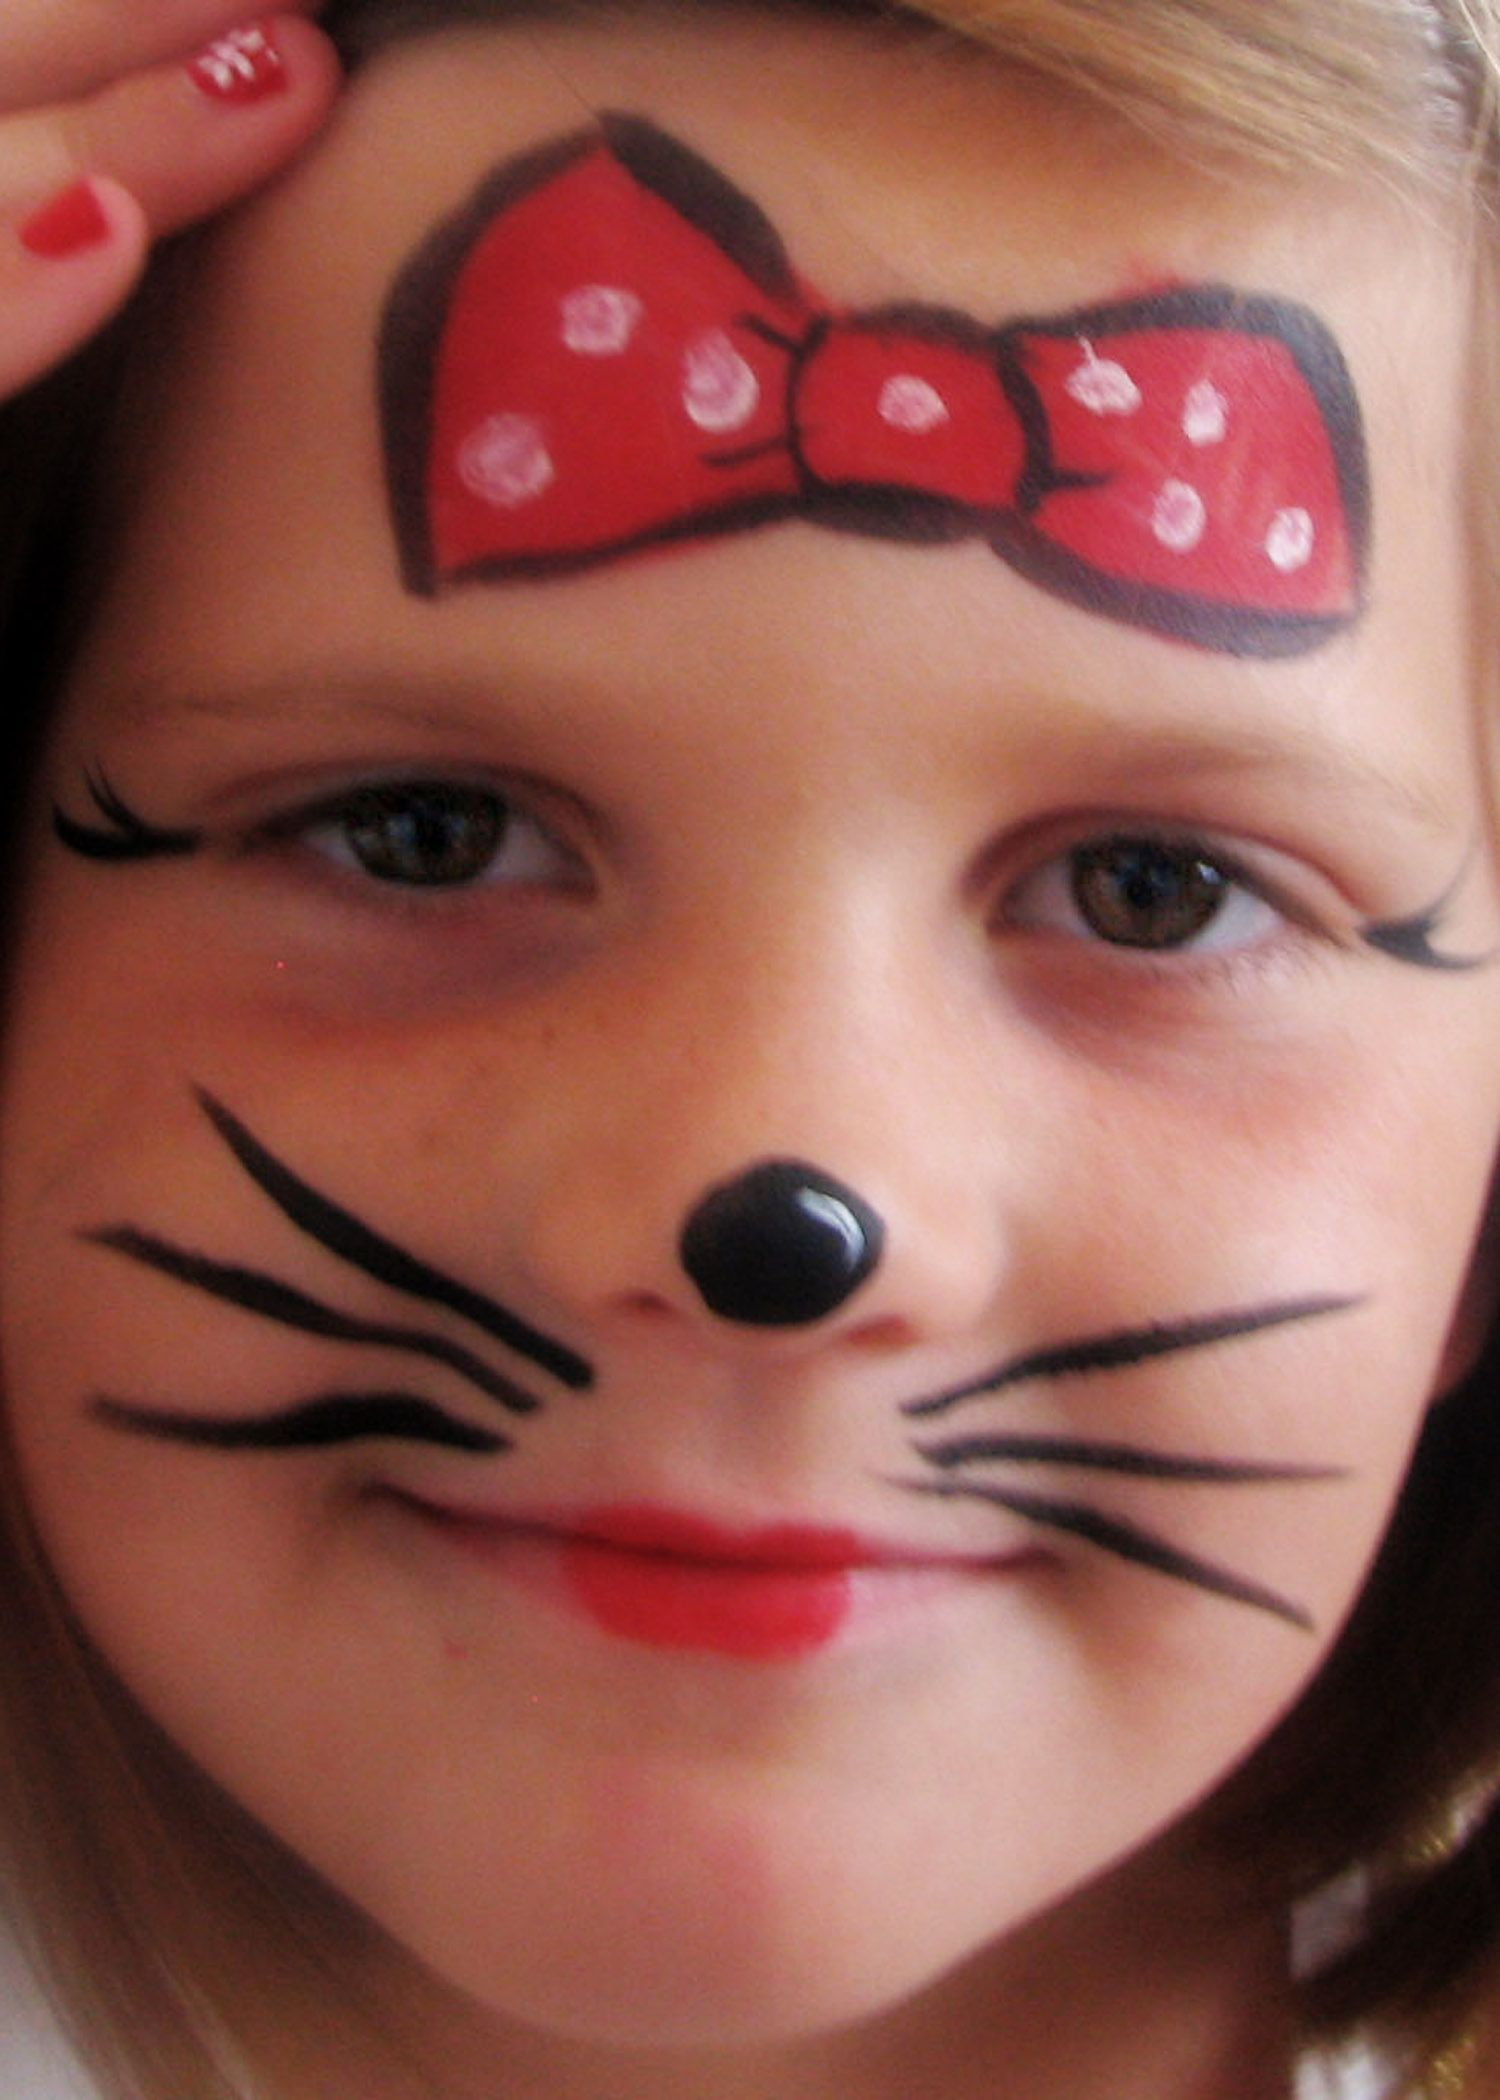 minnie mouse so cute fasching pinterest kinder schminken kinderschminken und fasching. Black Bedroom Furniture Sets. Home Design Ideas